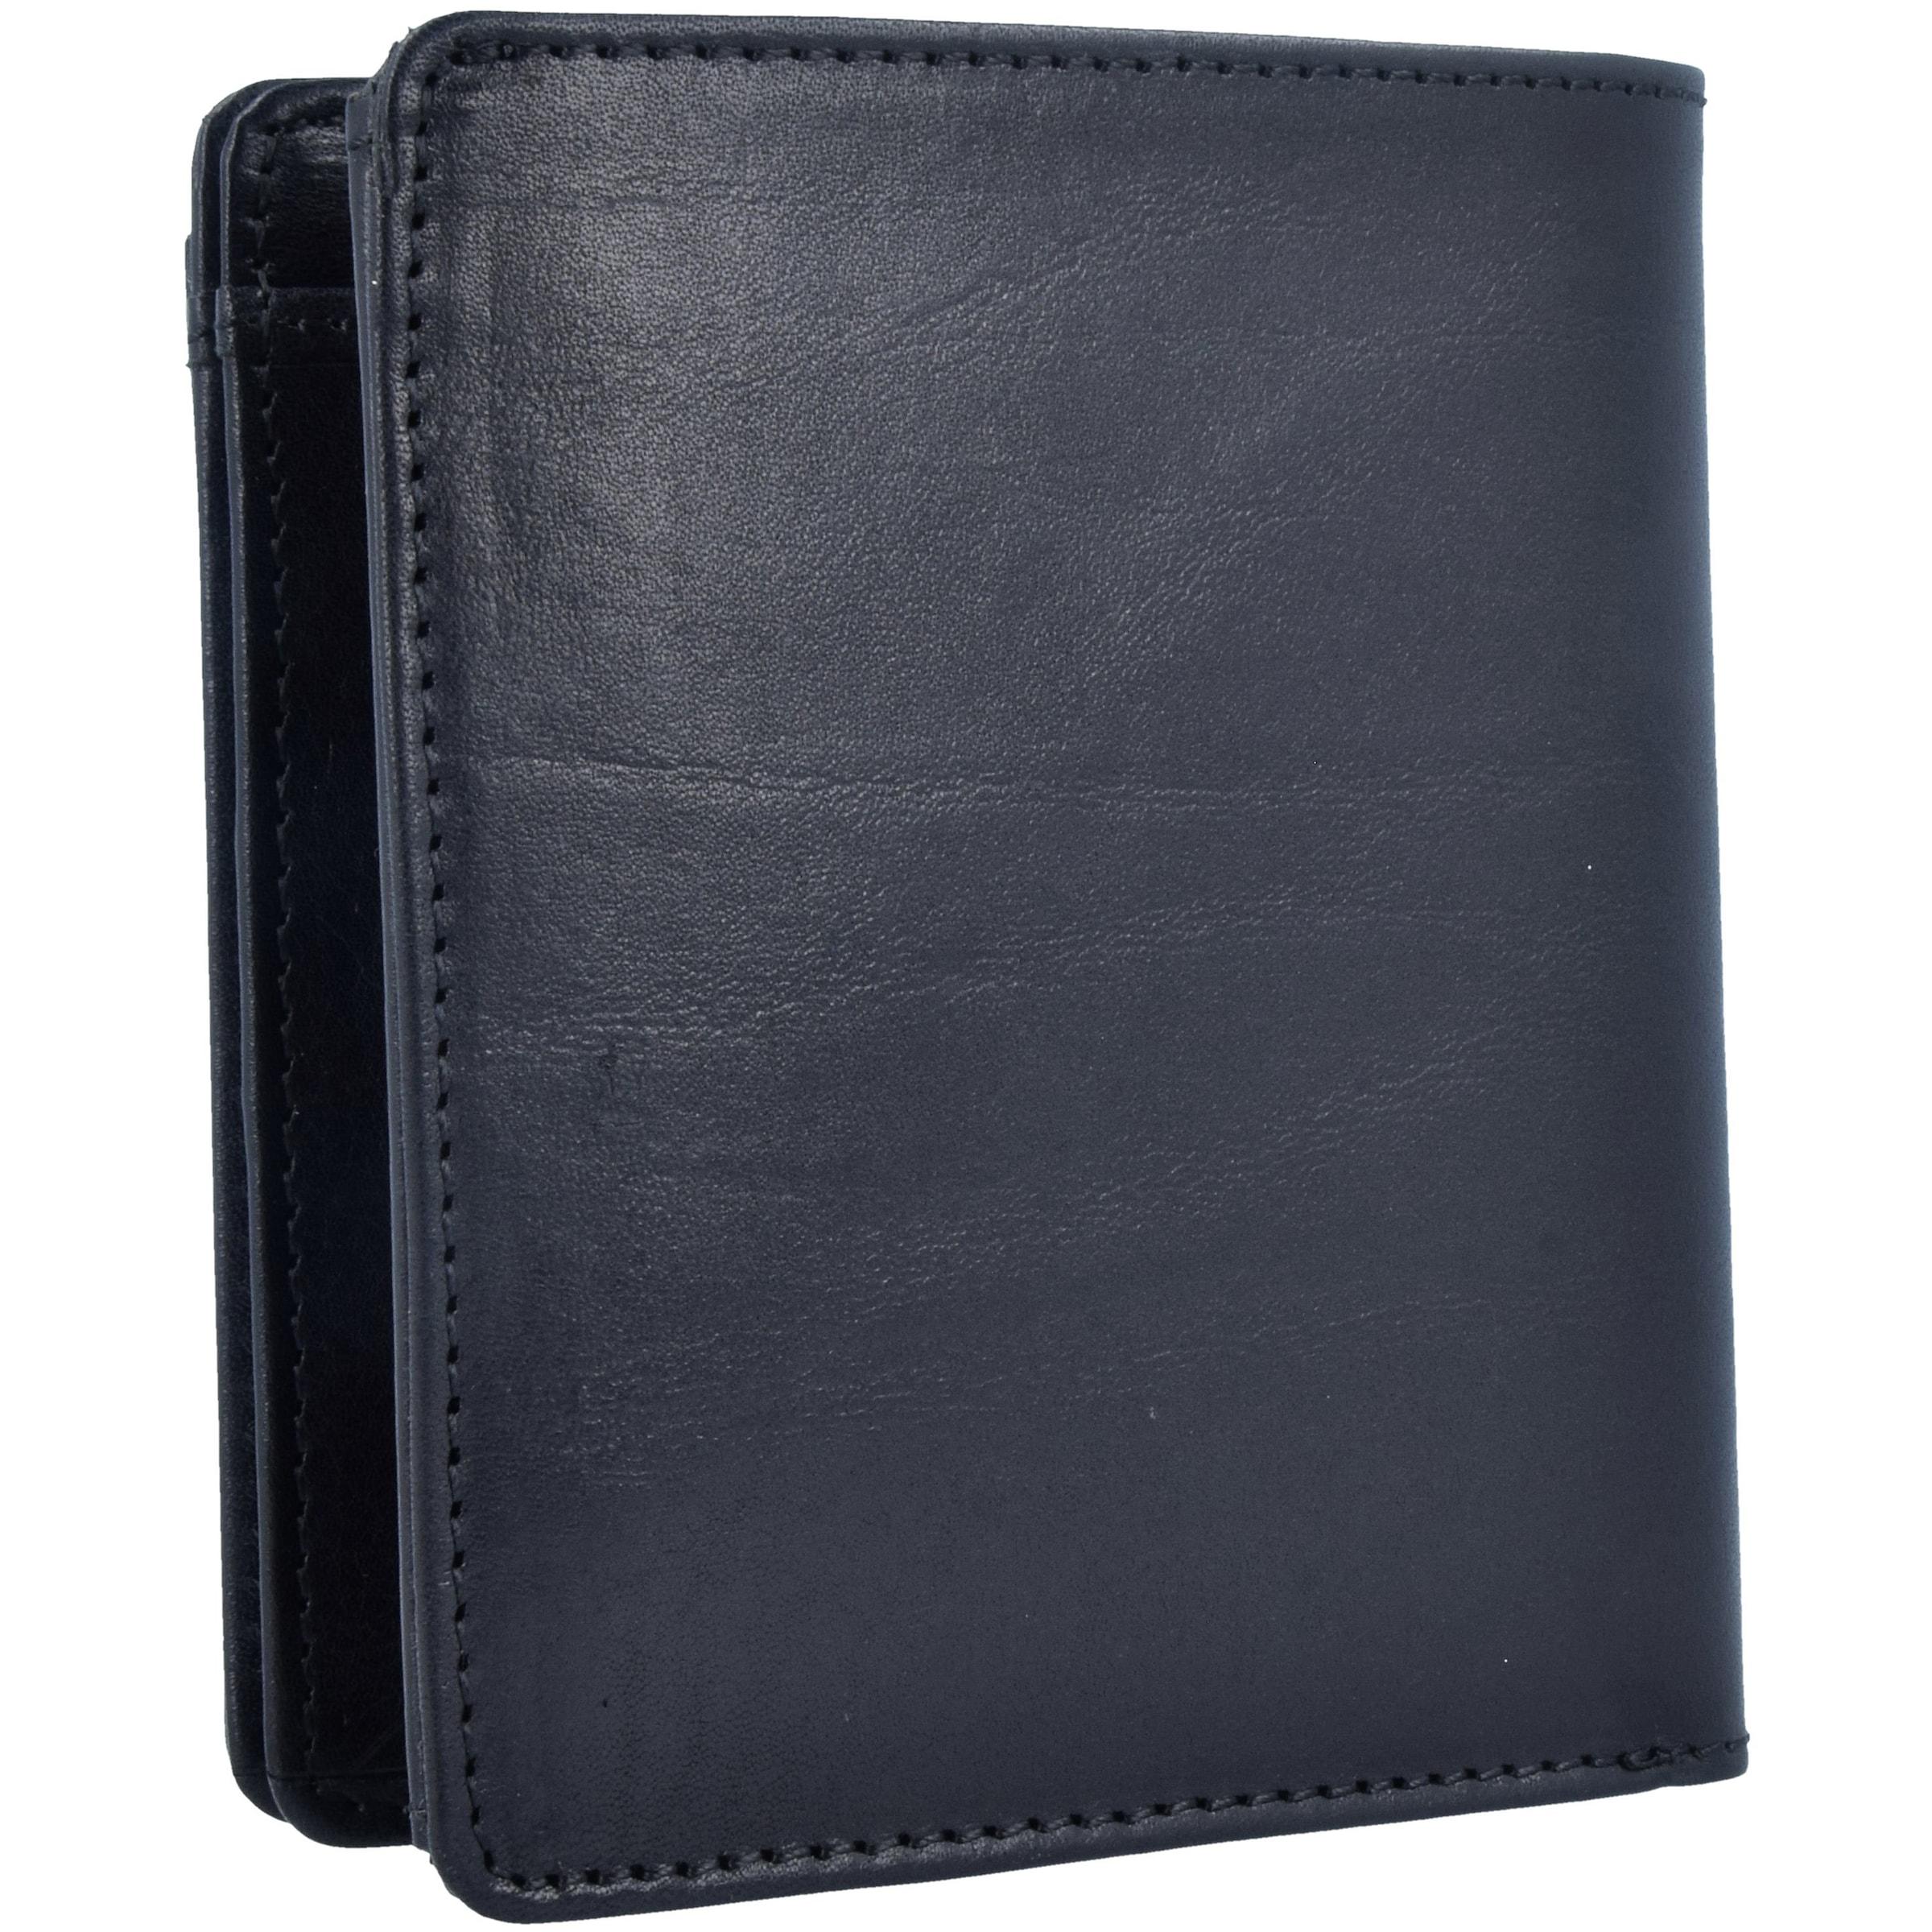 Noir monnaies Braun En Porte 8cs' H Büffel 'venice NXO8Pnwk0